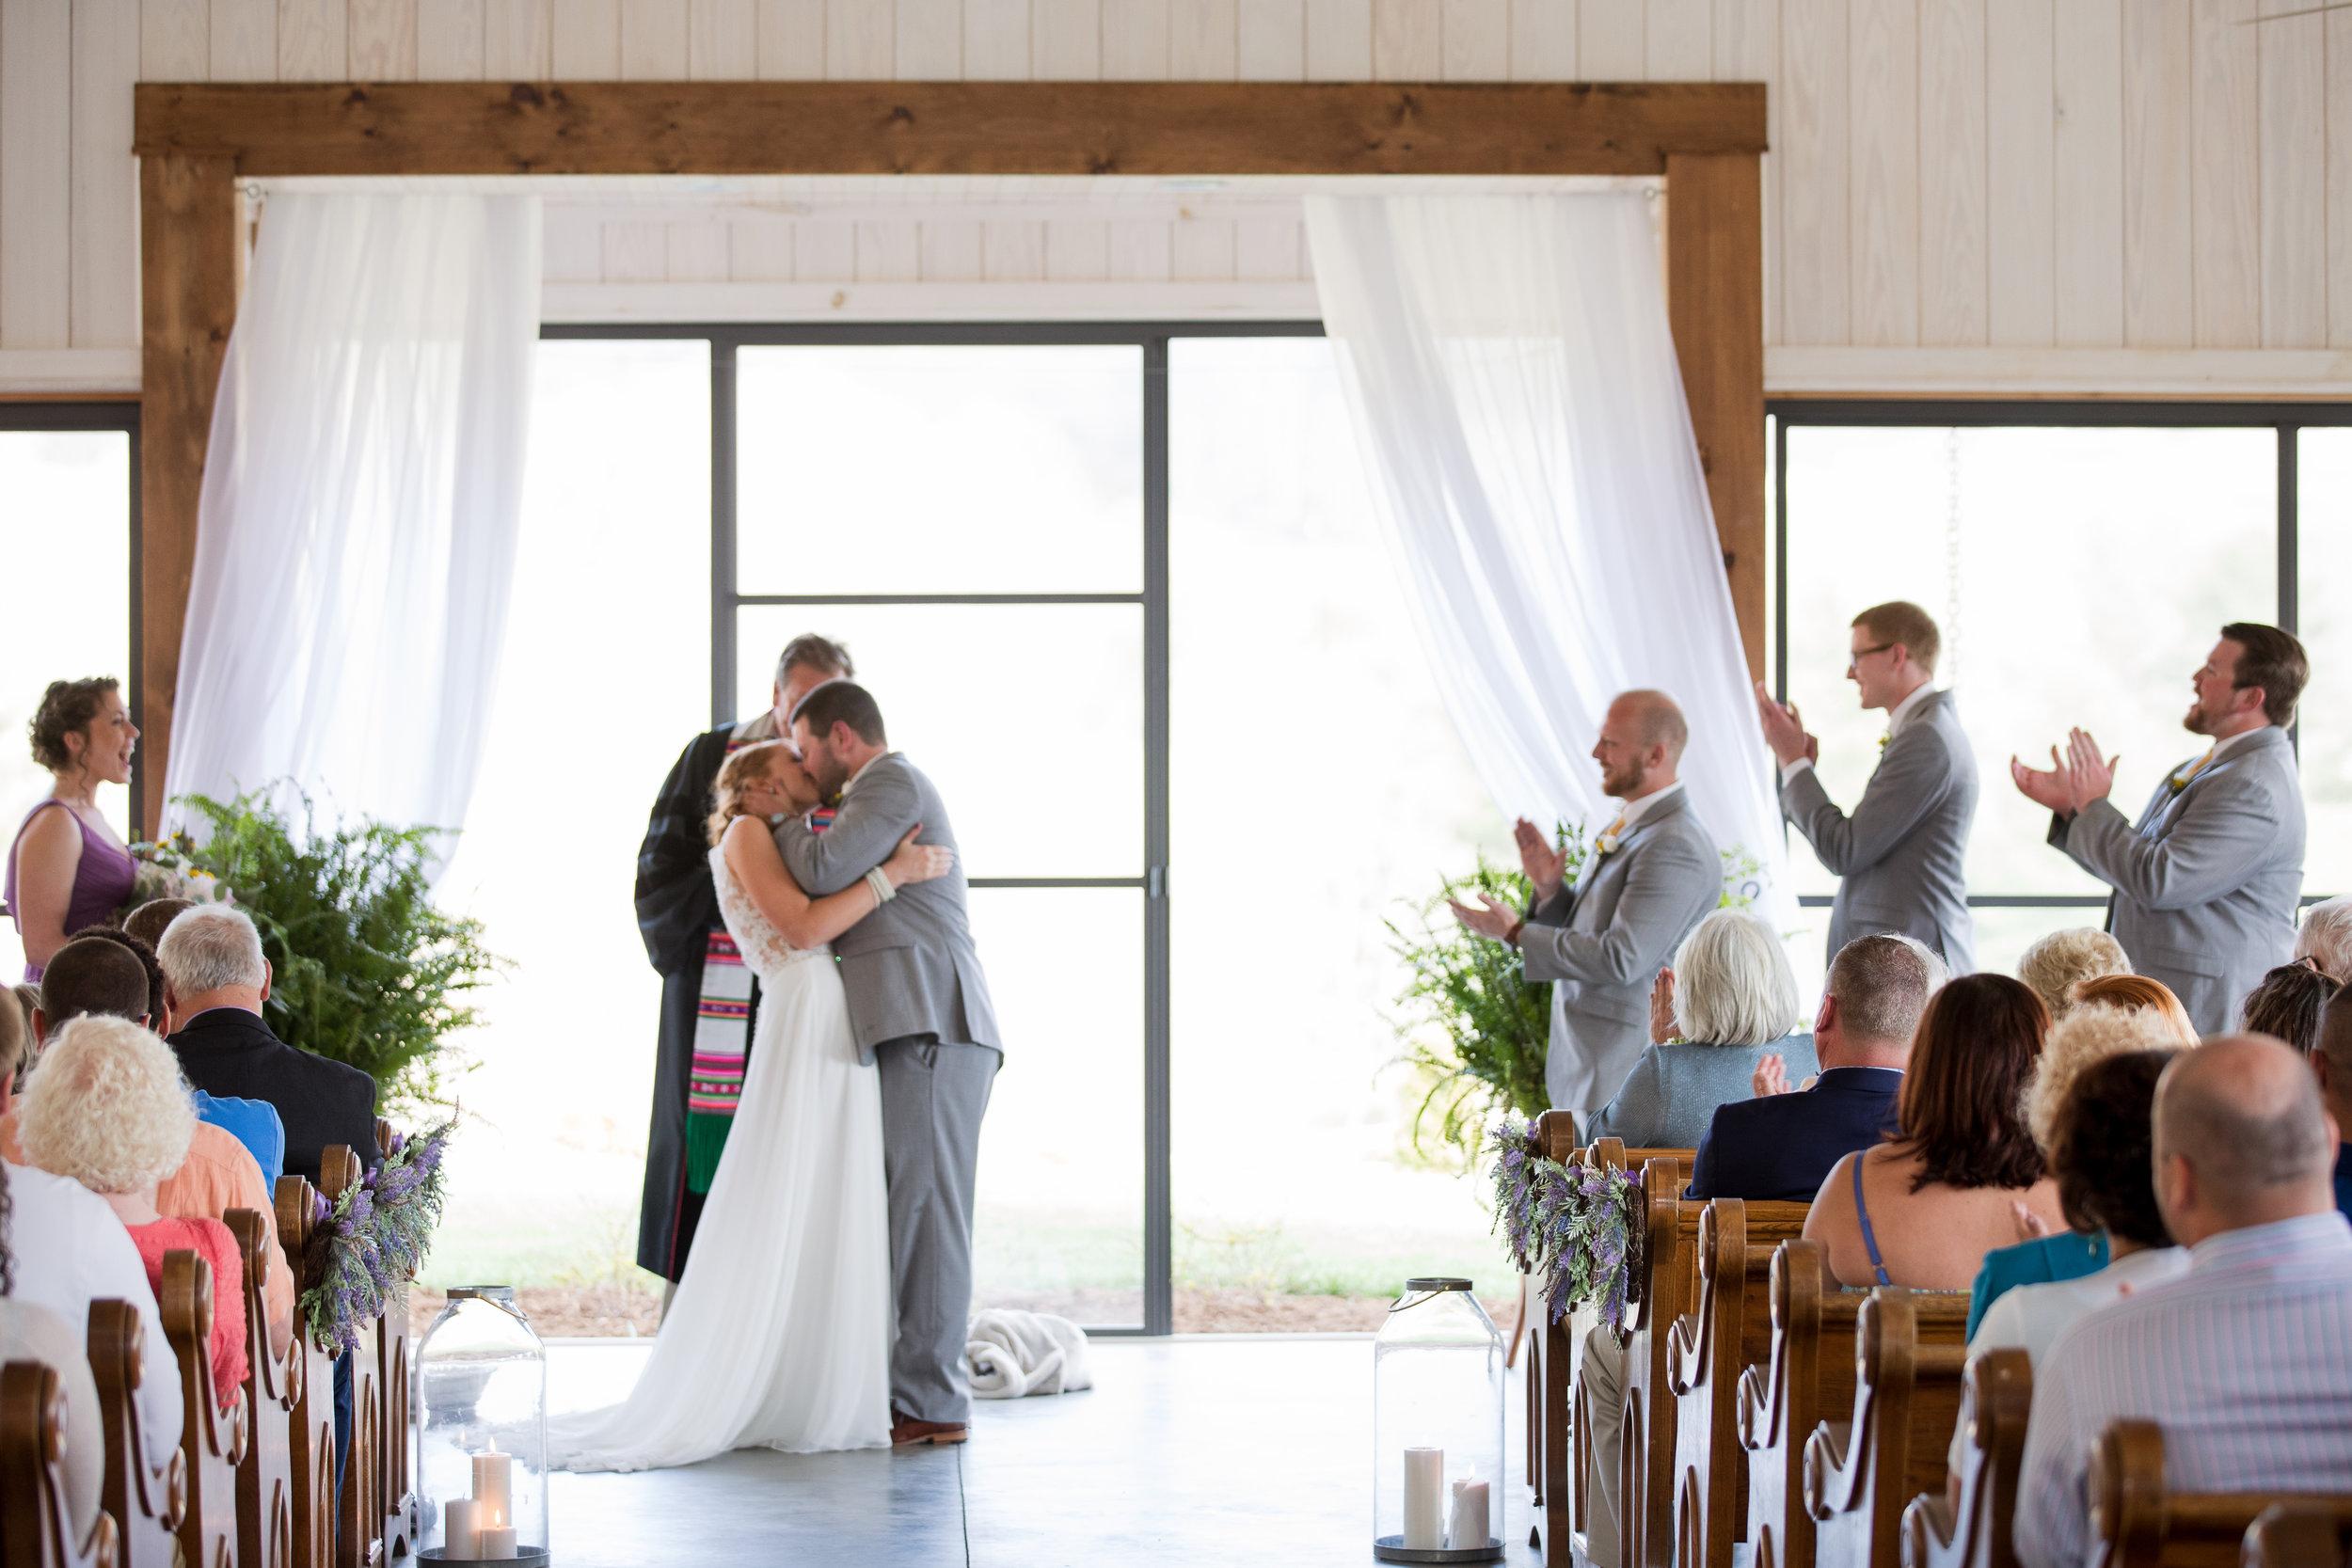 Joy-Unscripted-Wedding-Calligraphy-Arney-392.jpg